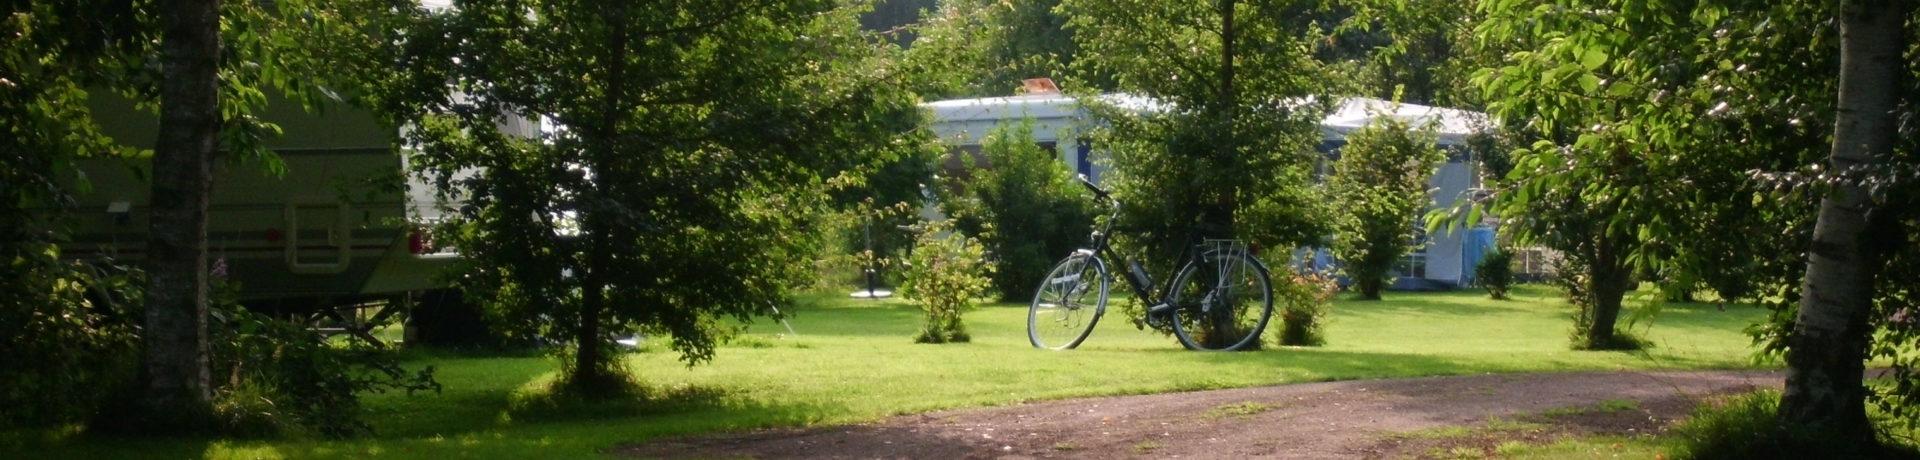 Camping De Peelhof in Erica ist ein Charme Camping in Drente.